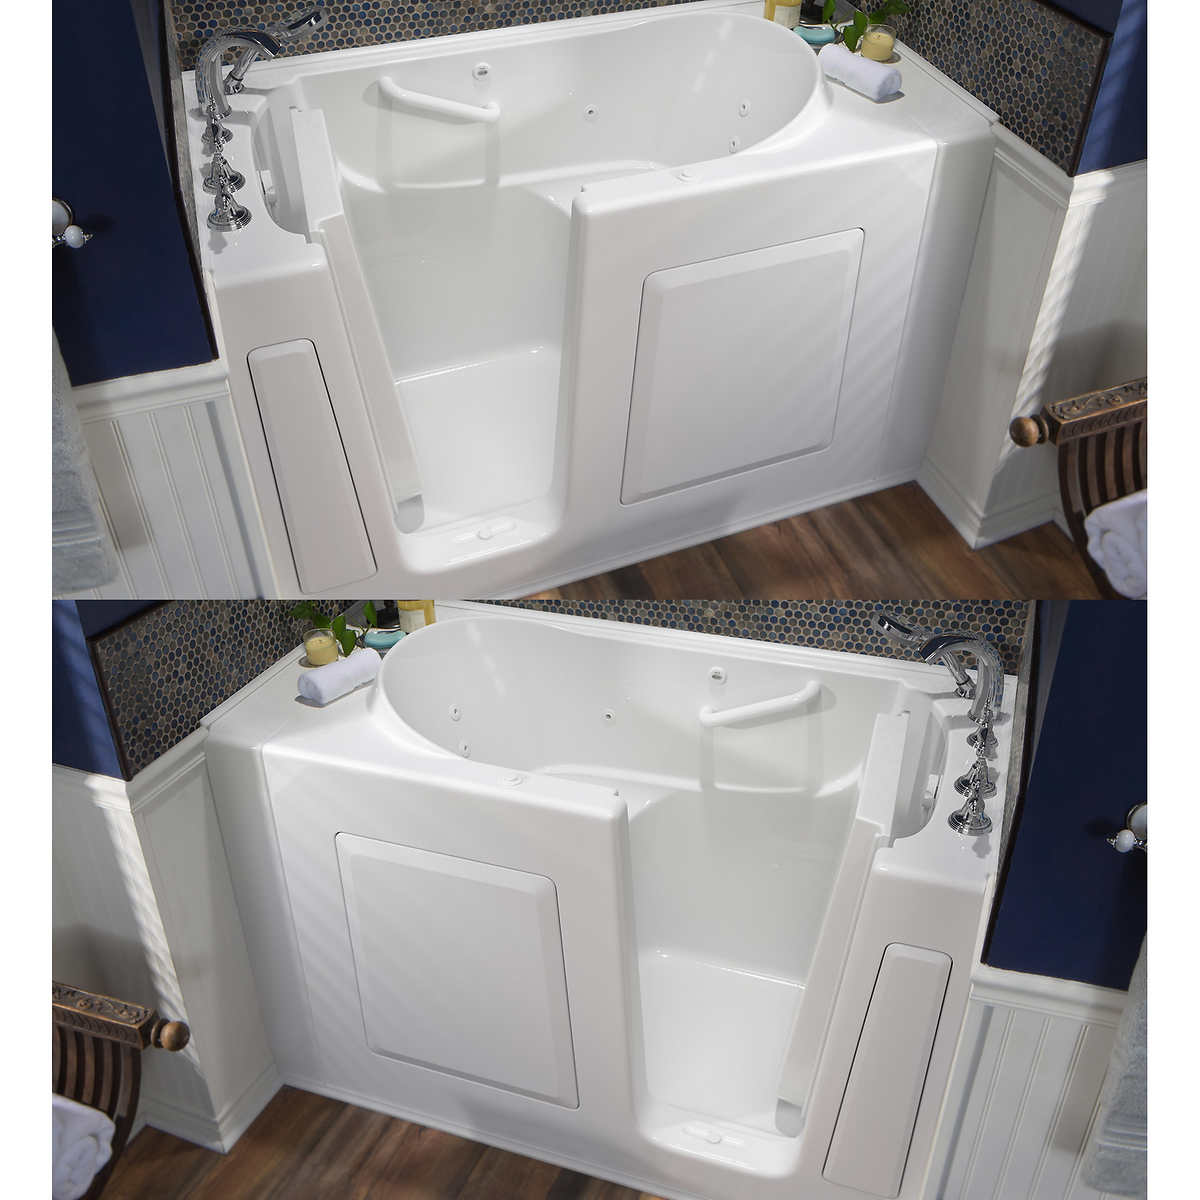 American Standard® 30 in. x 54 in. Walk-in Bathtub with 13 Jet ...